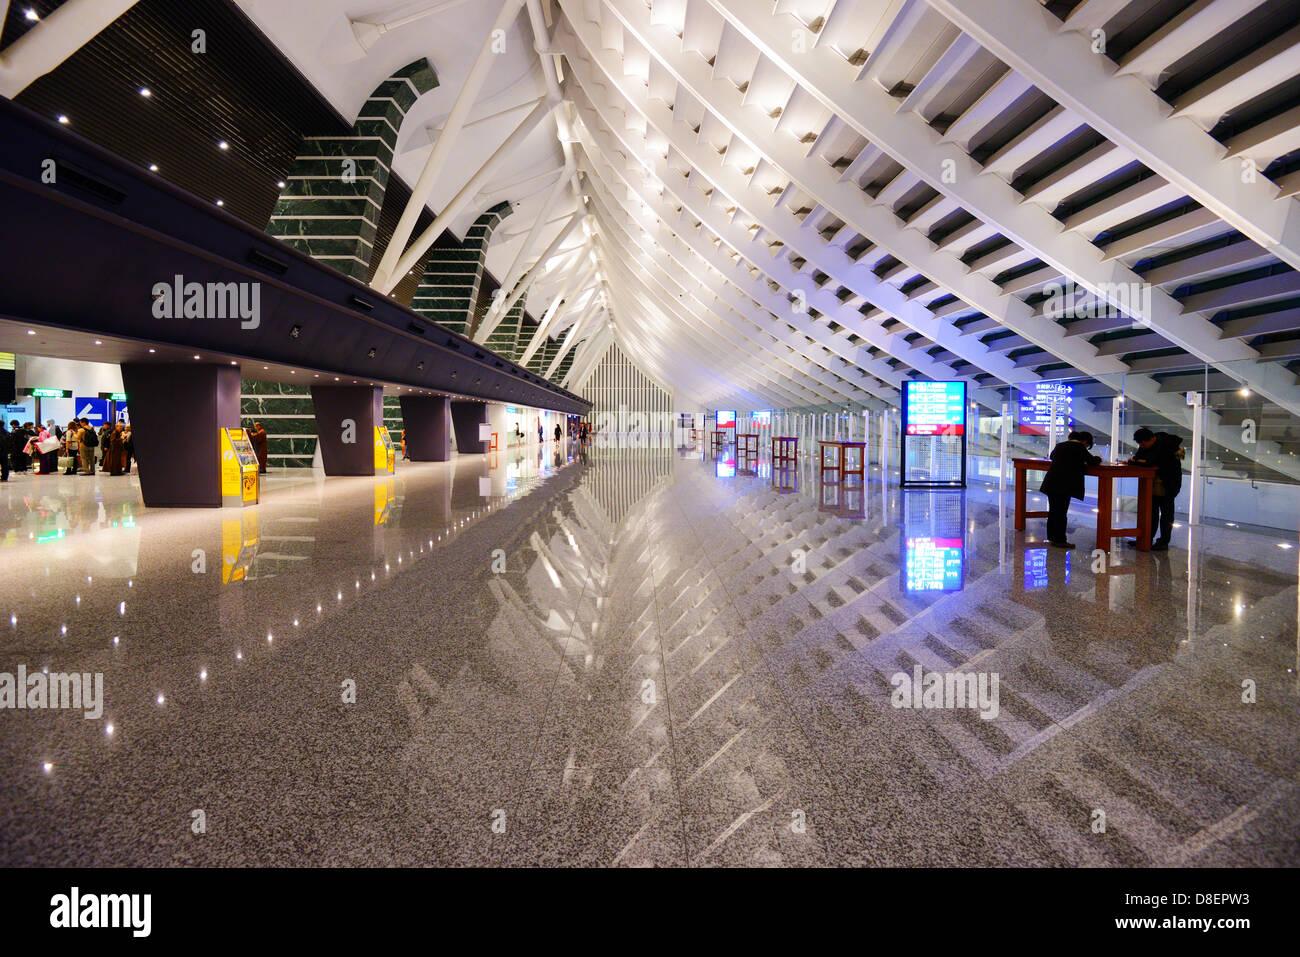 Taiwan Taoyuan International Airport customs lobby. - Stock Image